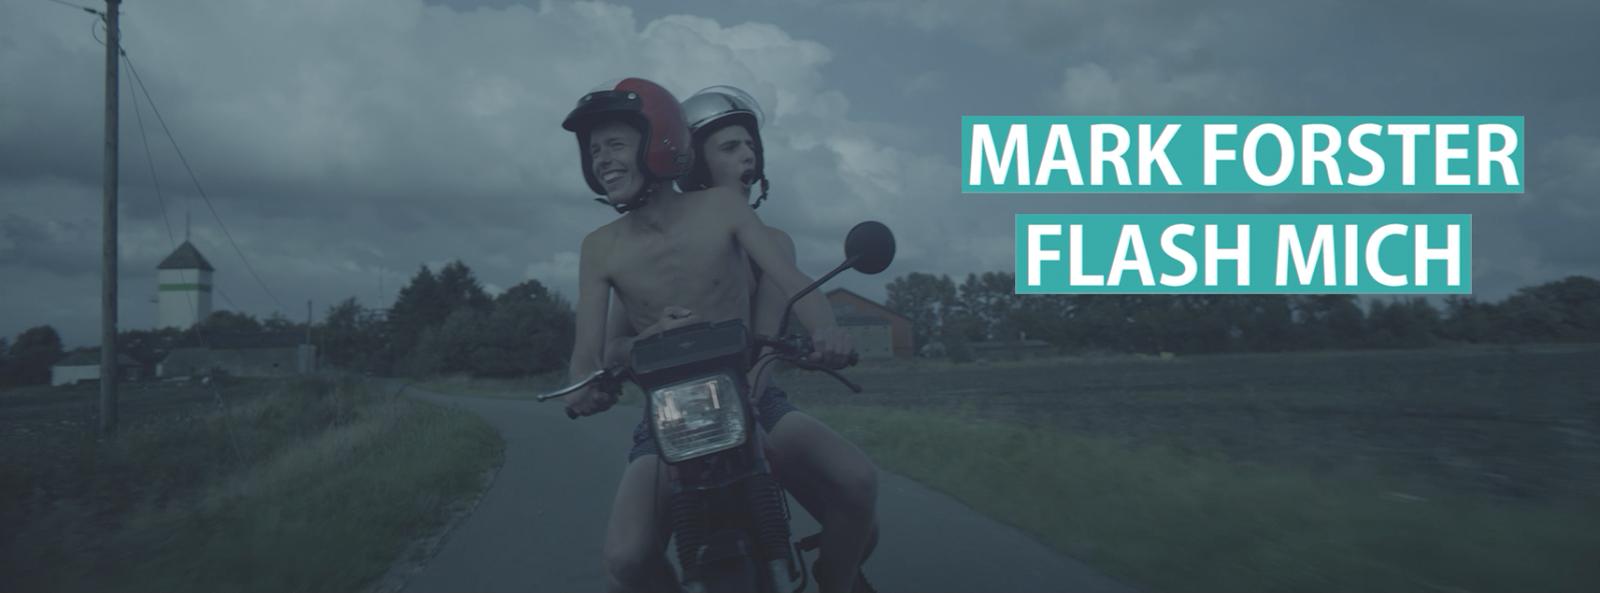 Queere Videos 12: Mark Forster mit \